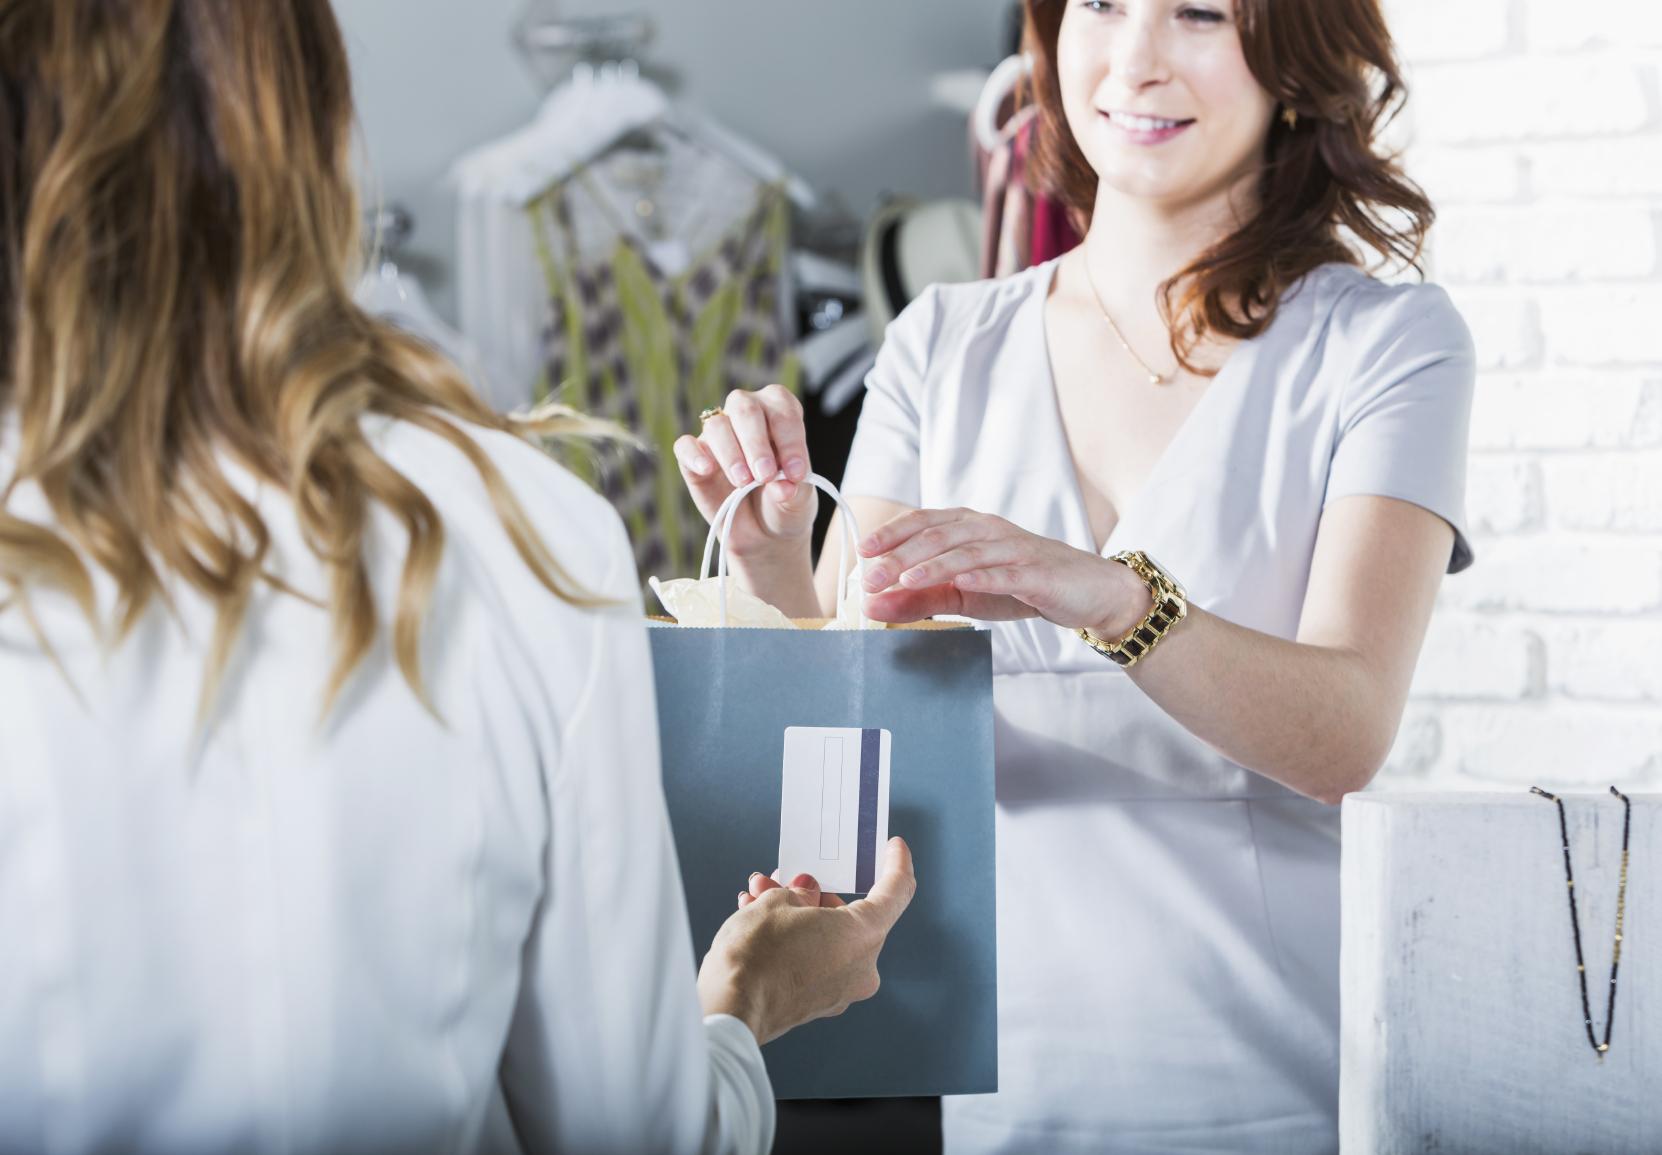 Good Salesman Techniques  To Aid The Aisle Clerk